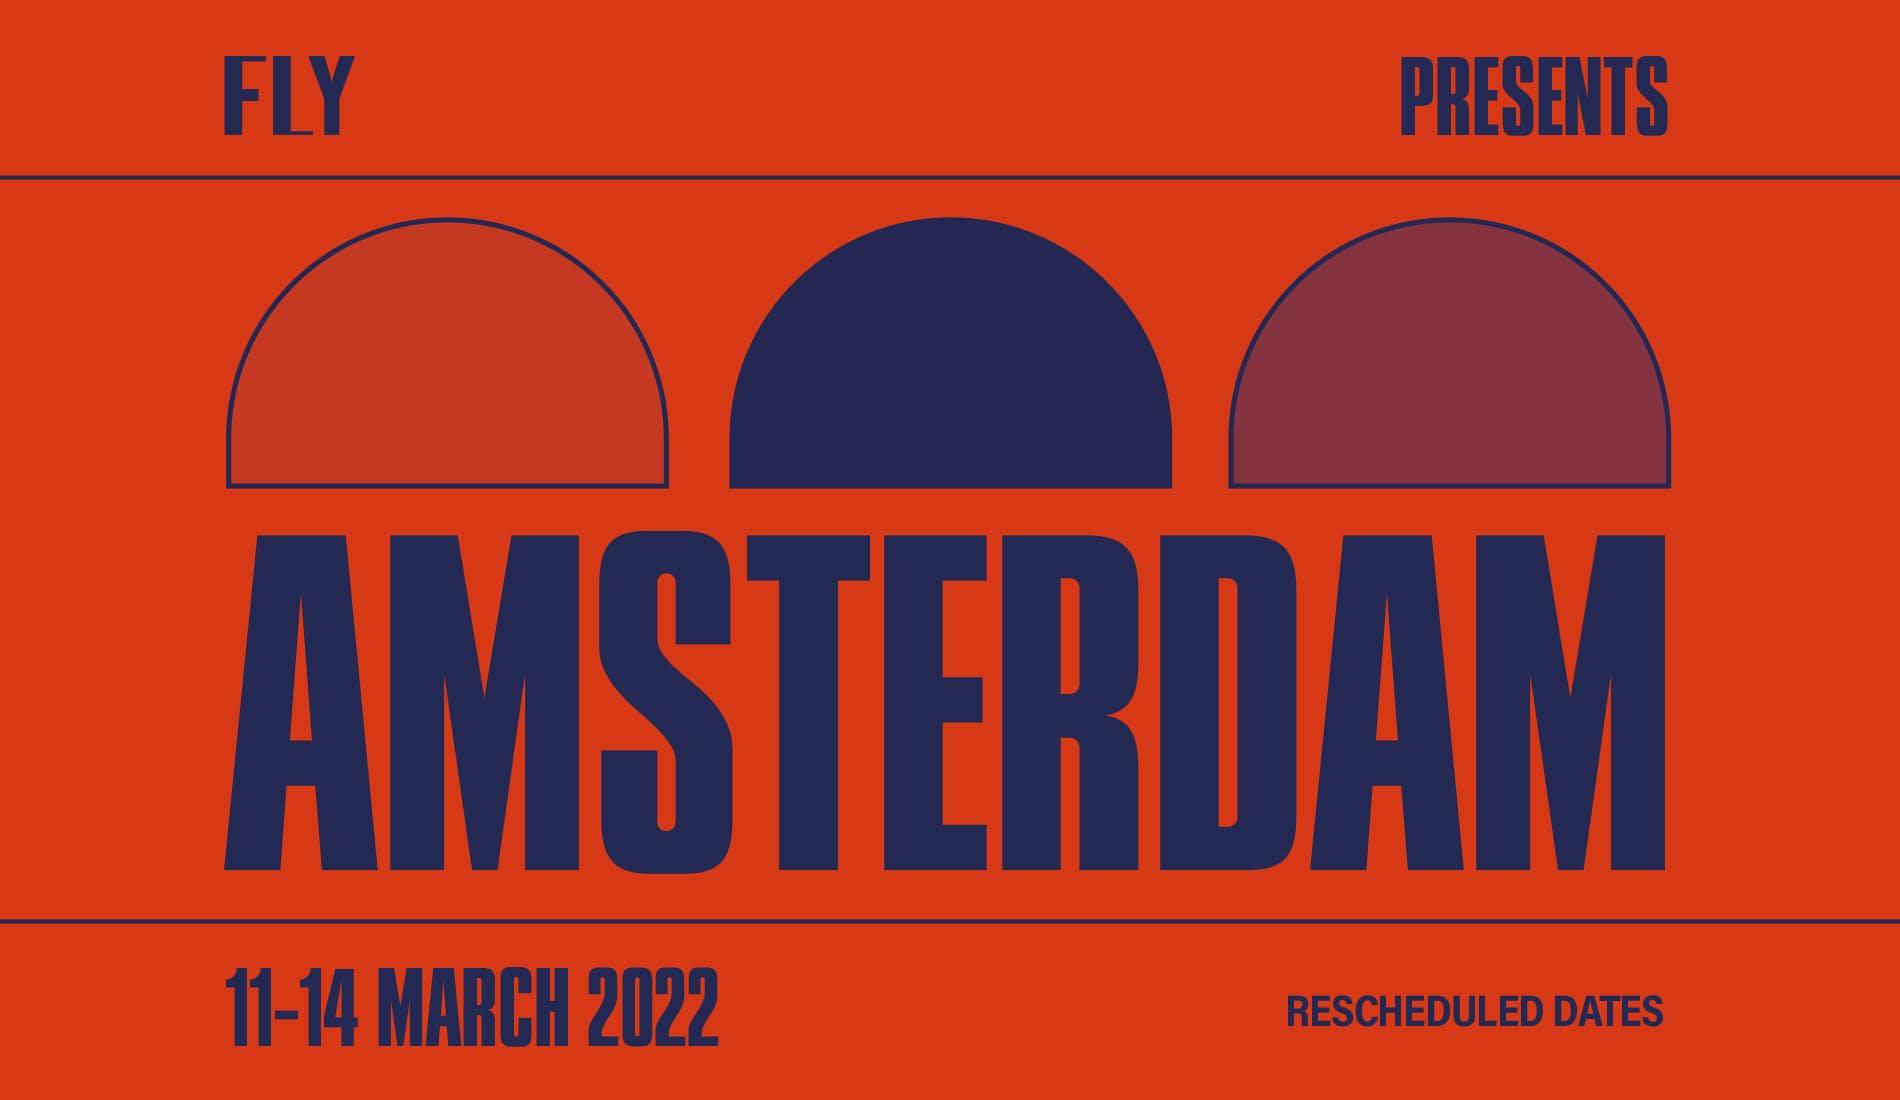 FLY Amsterdam background image